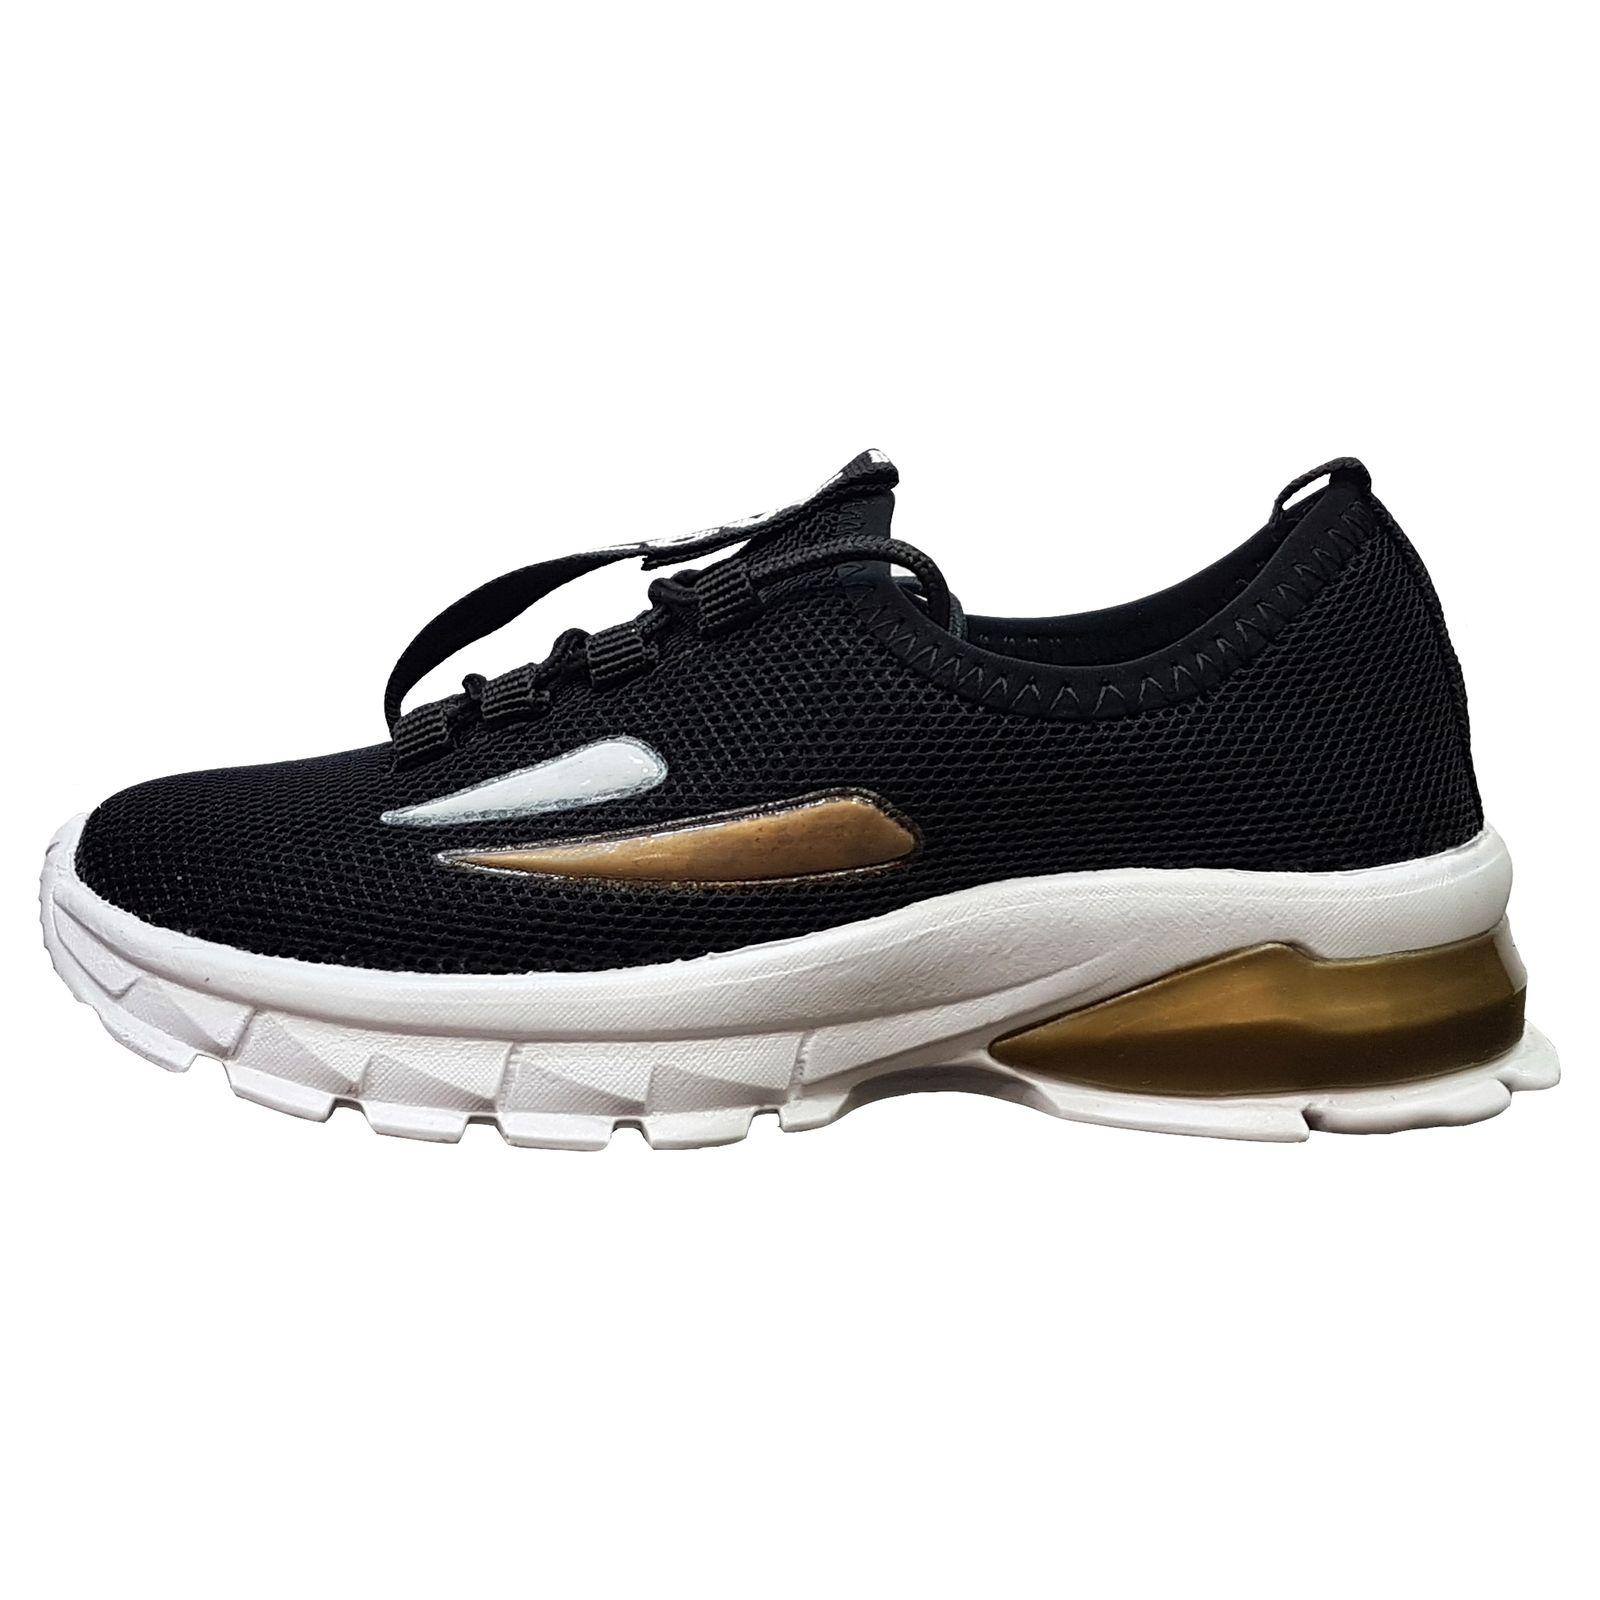 کفش پیاده روی پسرانه کد 3328129 -  - 2